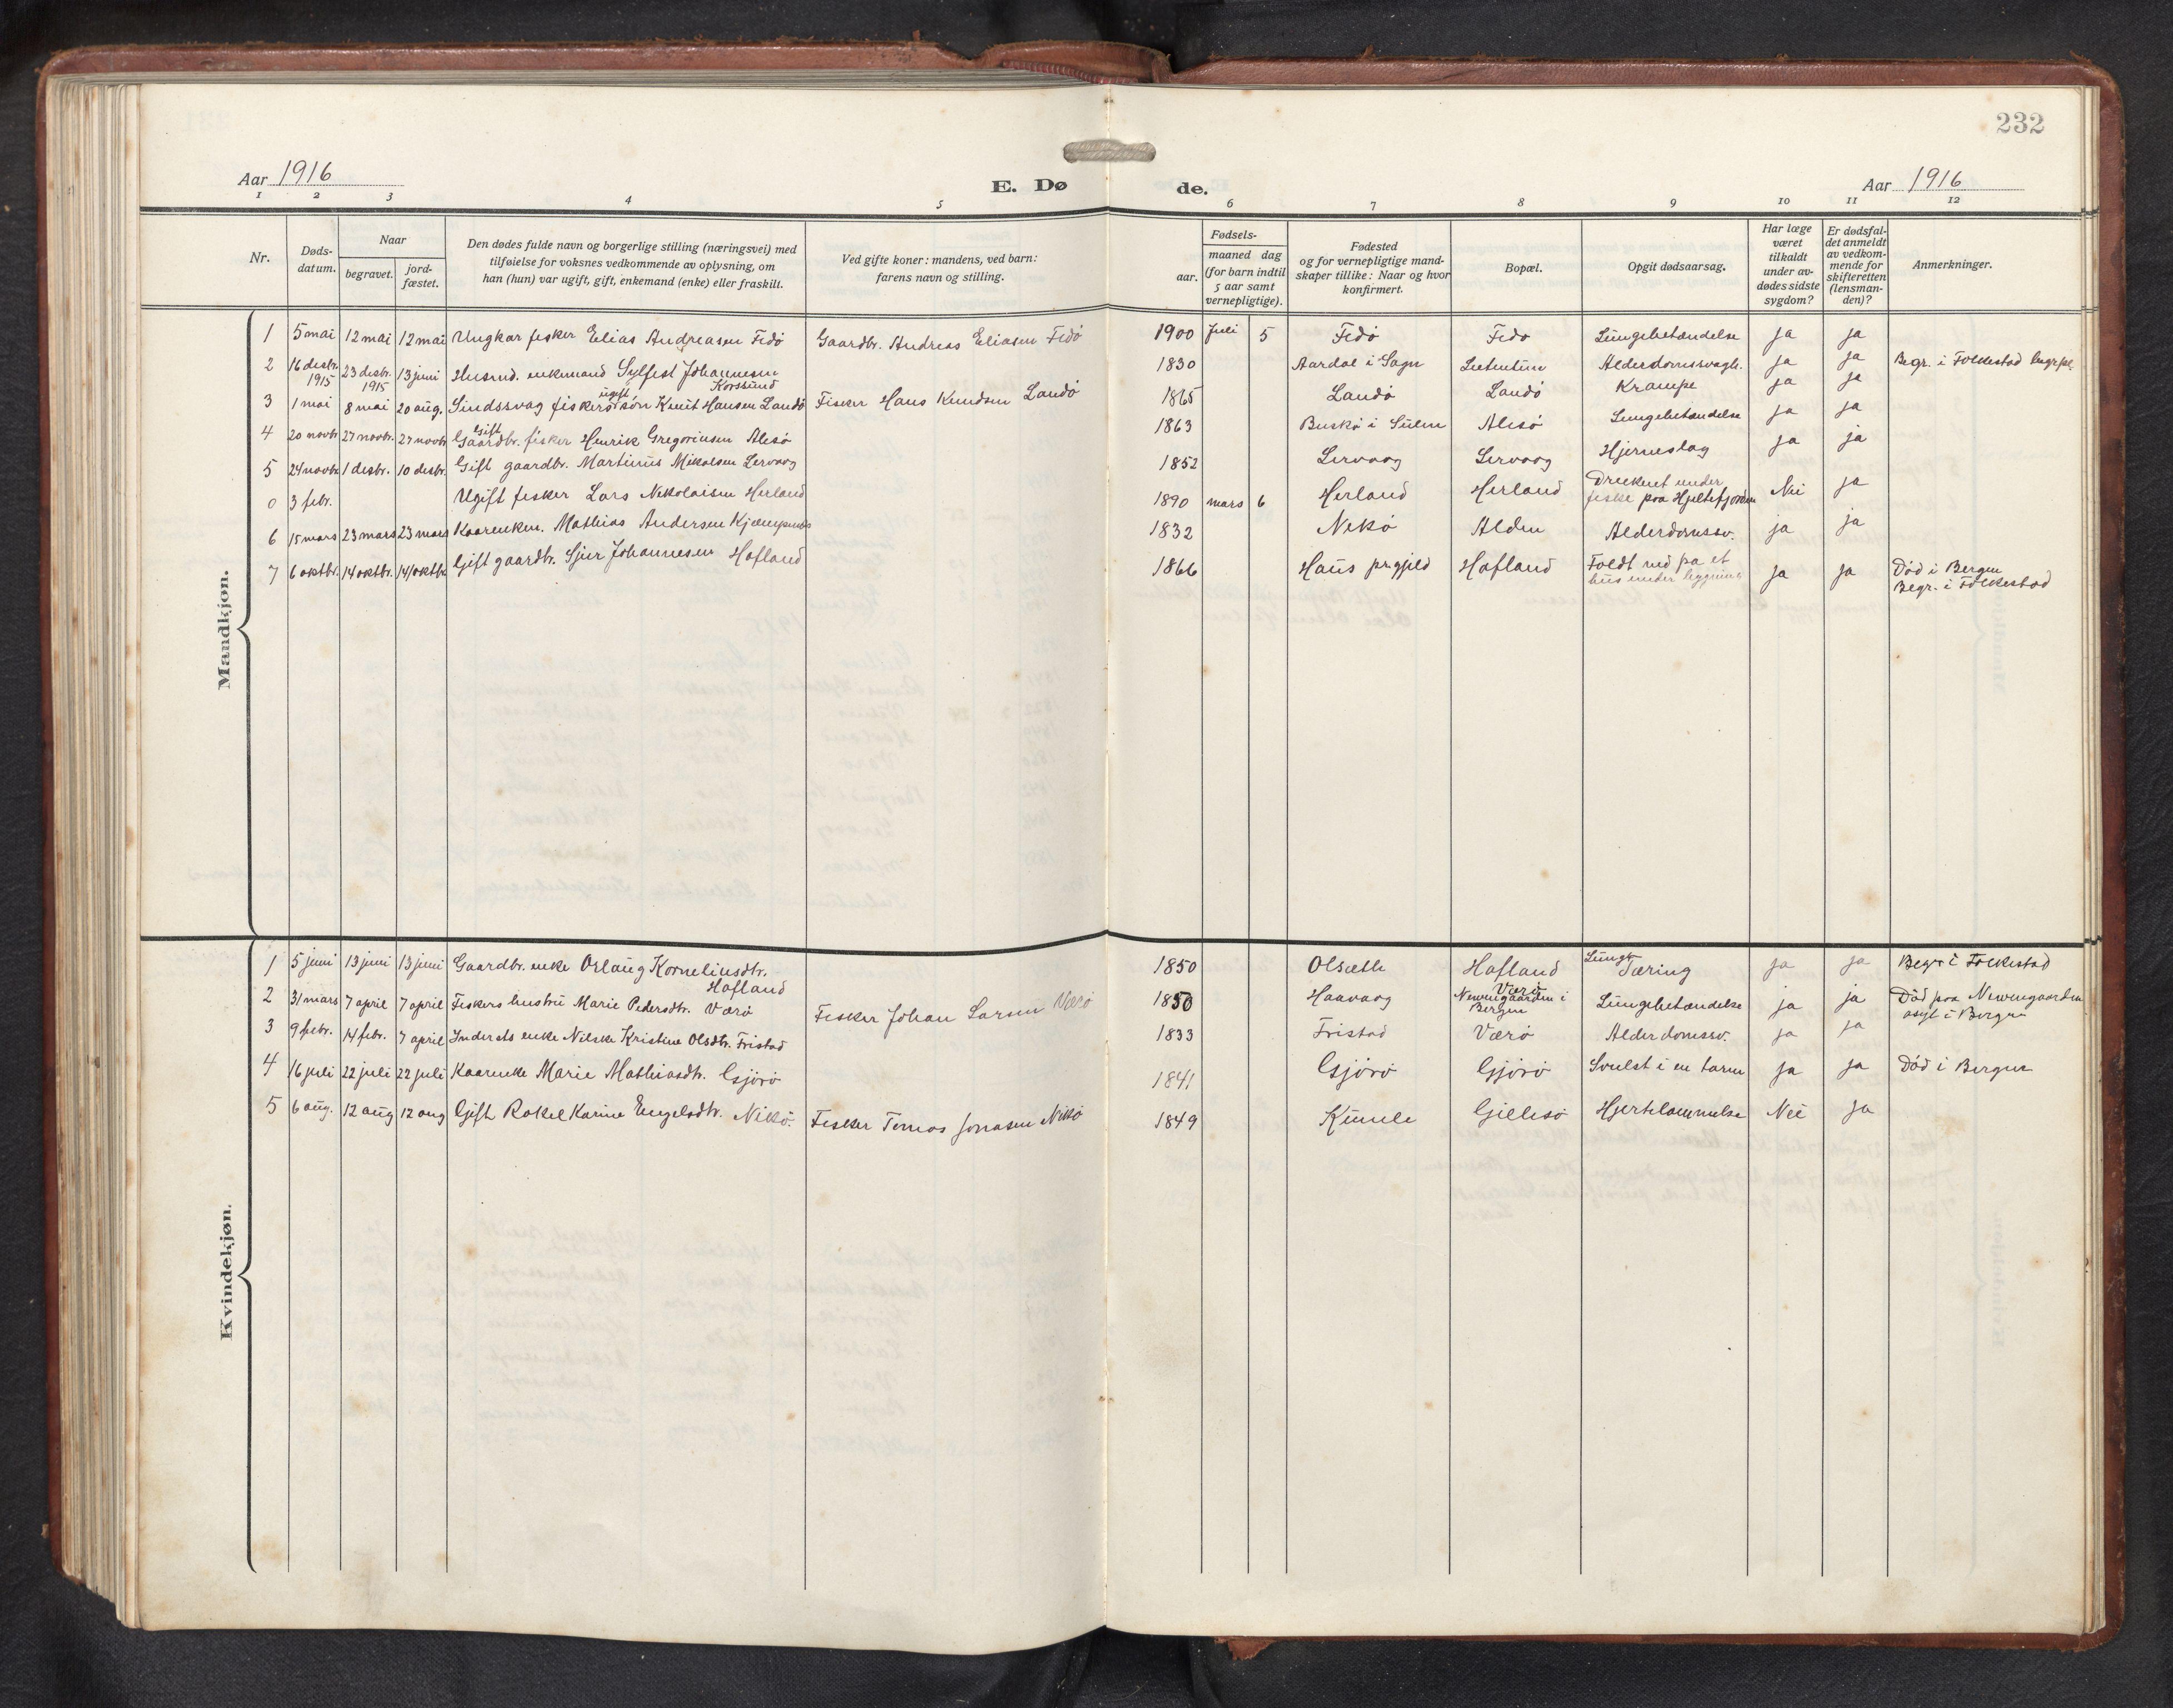 SAB, Askvoll sokneprestembete, H/Hab/Habb/L0002: Klokkerbok nr. B 2, 1910-1947, s. 231b-232a